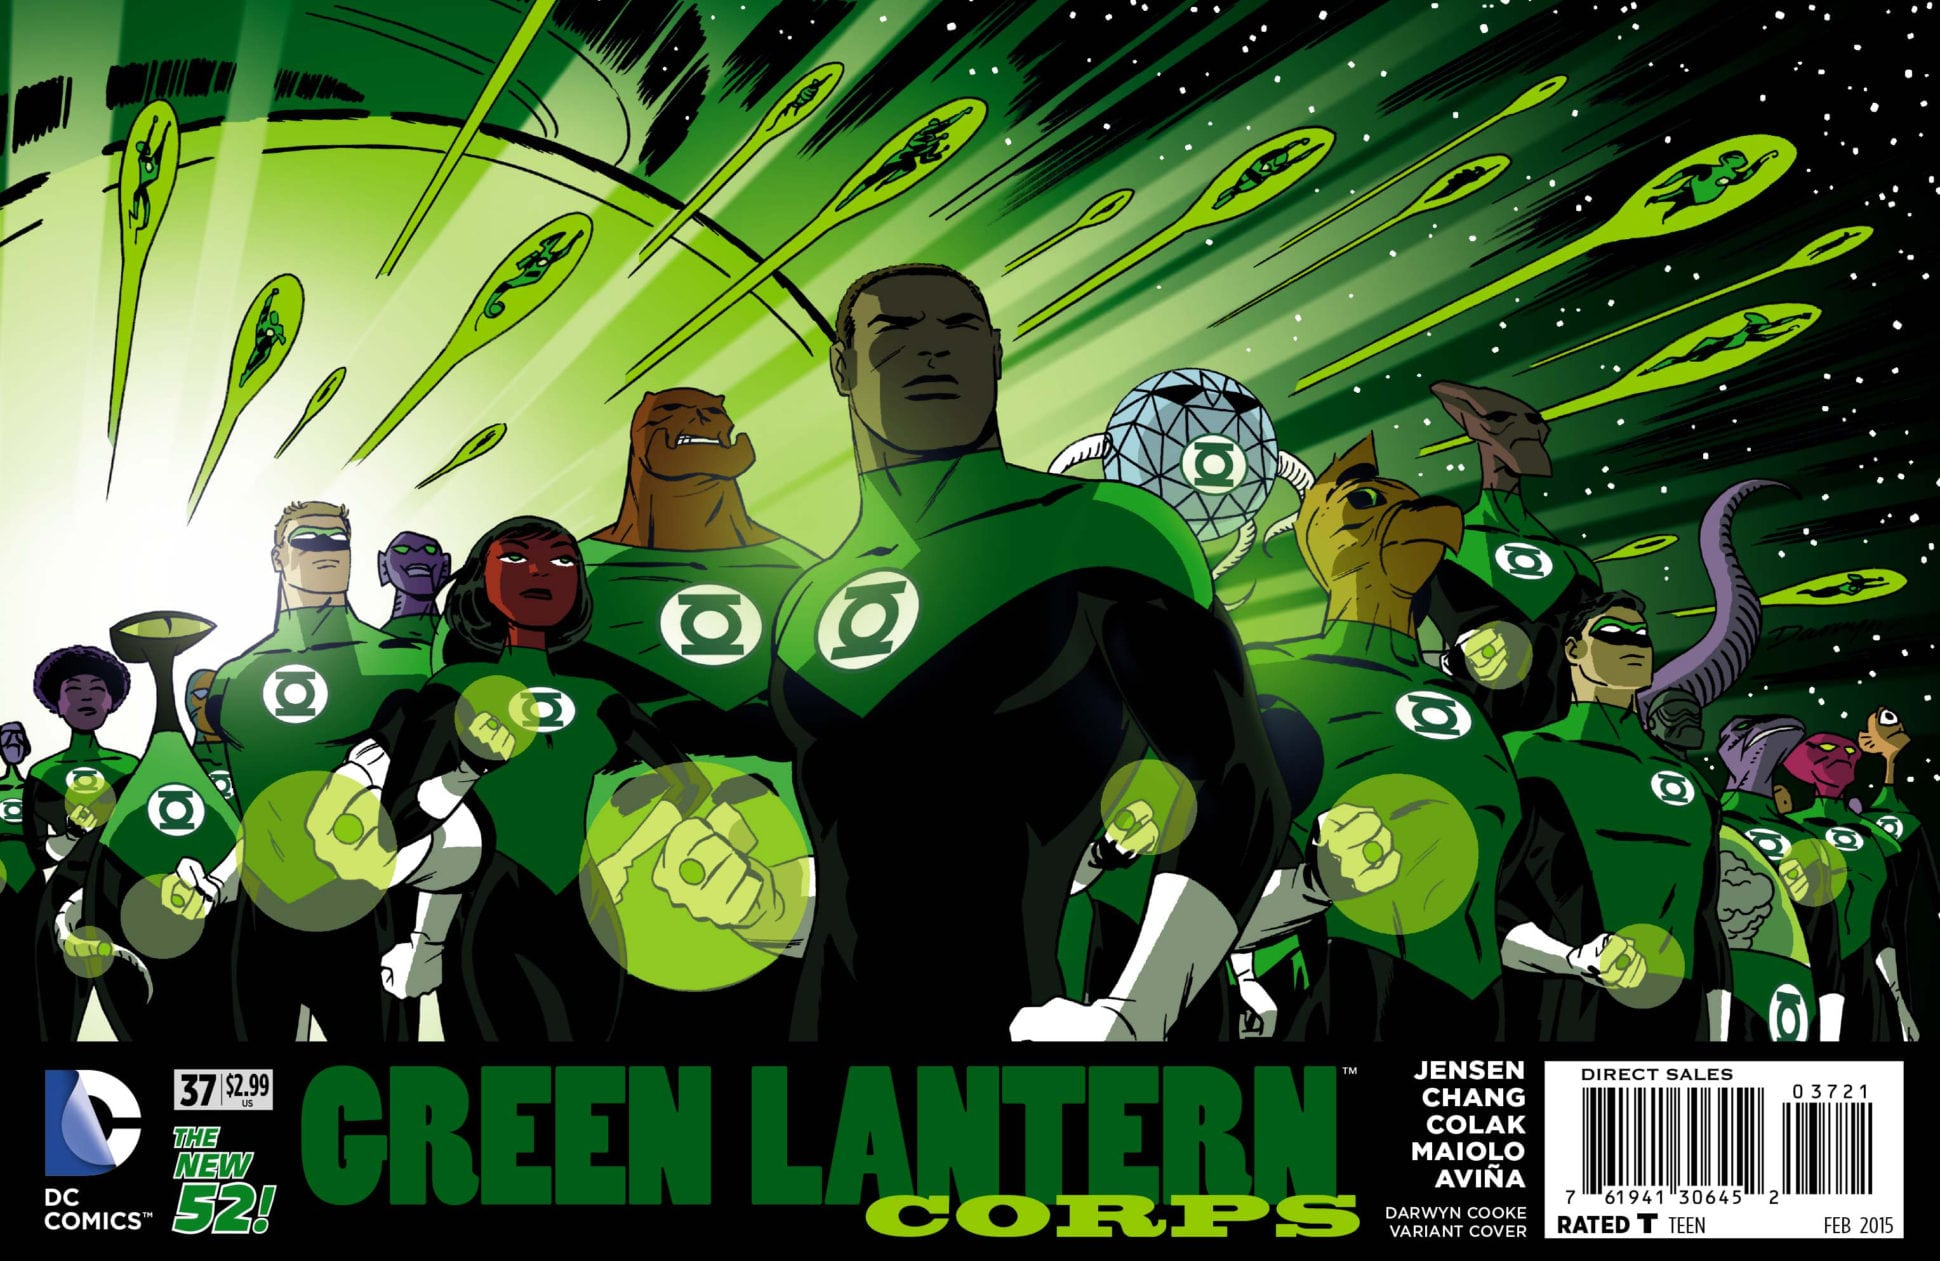 Green Lantern Corps #37